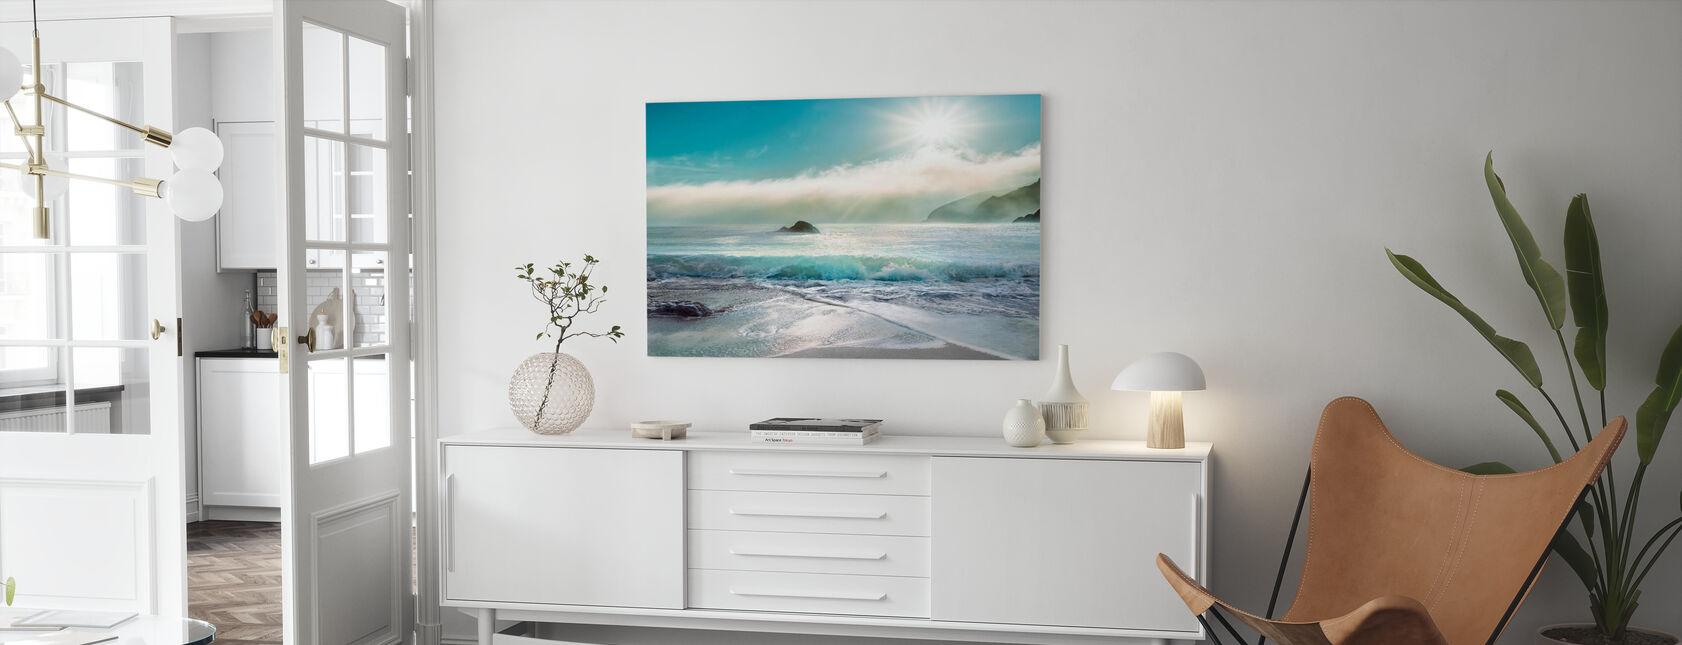 Sunlight over the Ocean - Canvas print - Living Room